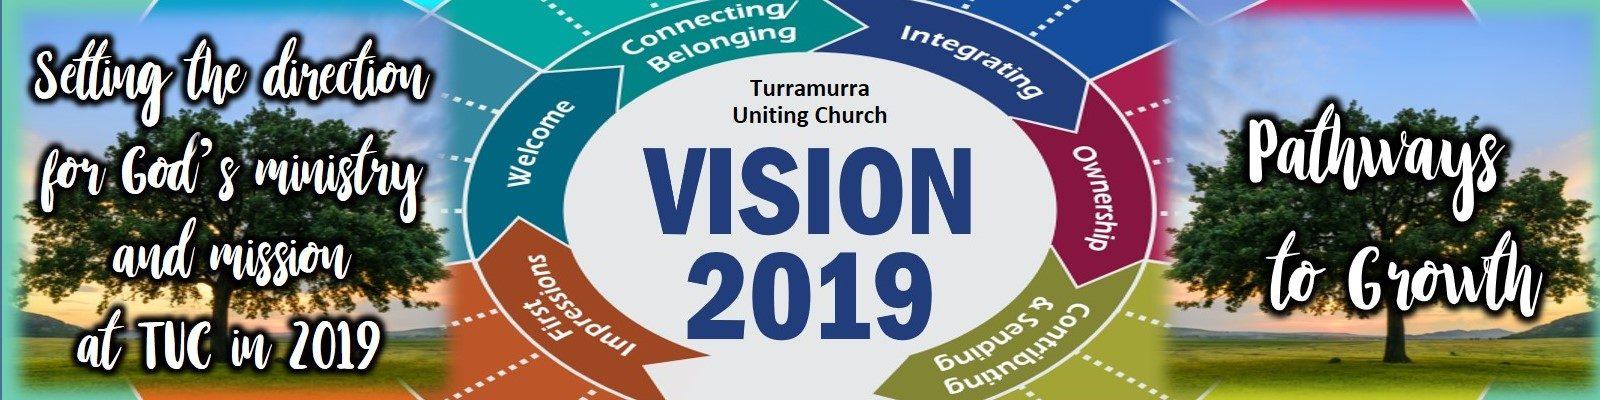 2019 Vision Document